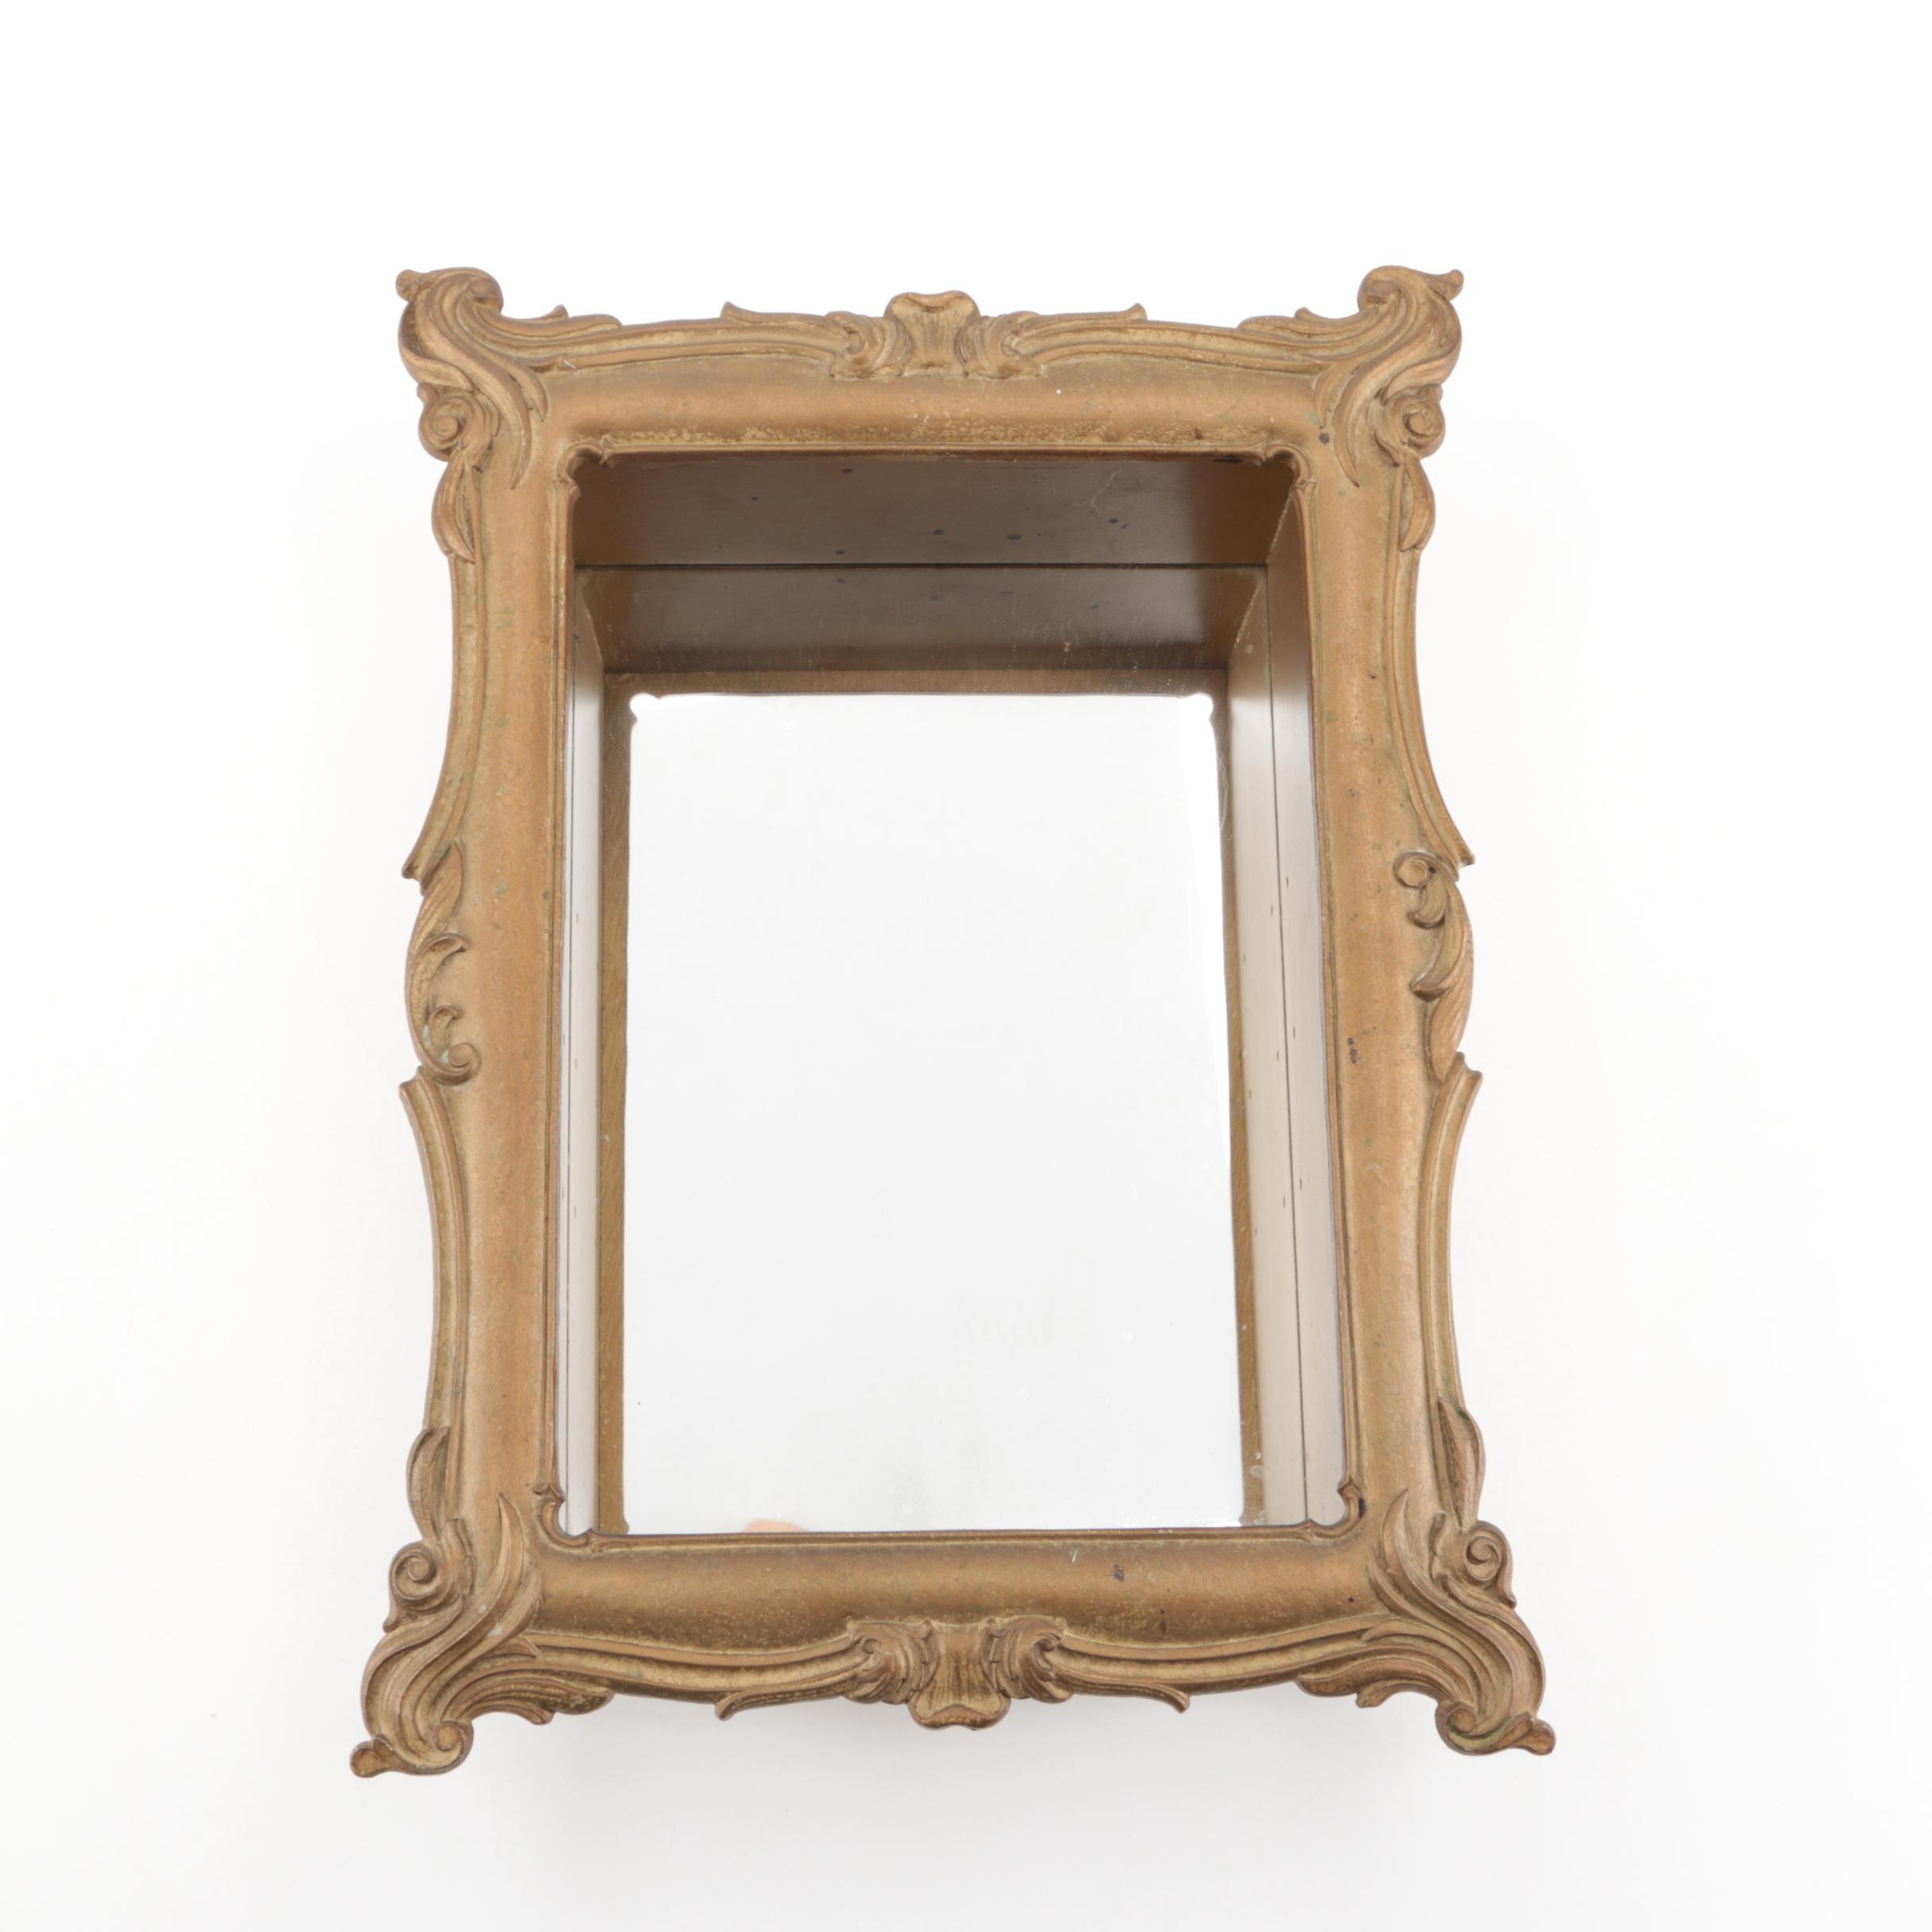 Louis XV Style Mirrored Display Shelf